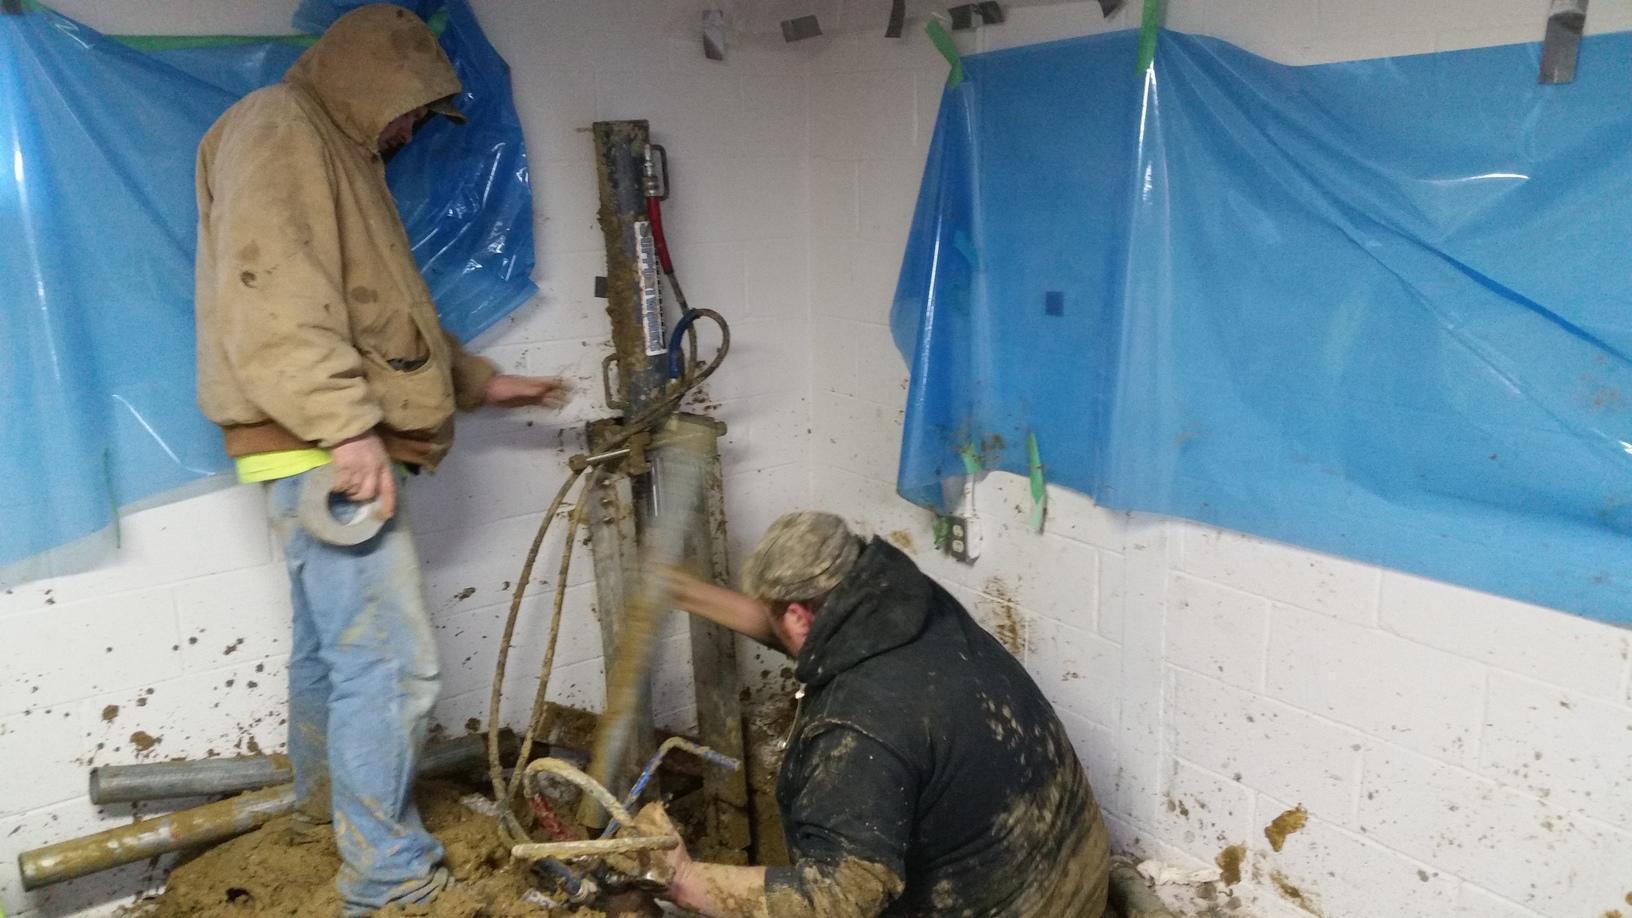 Crewmen hydraulically installed Push Piers to reach proper soil depths.